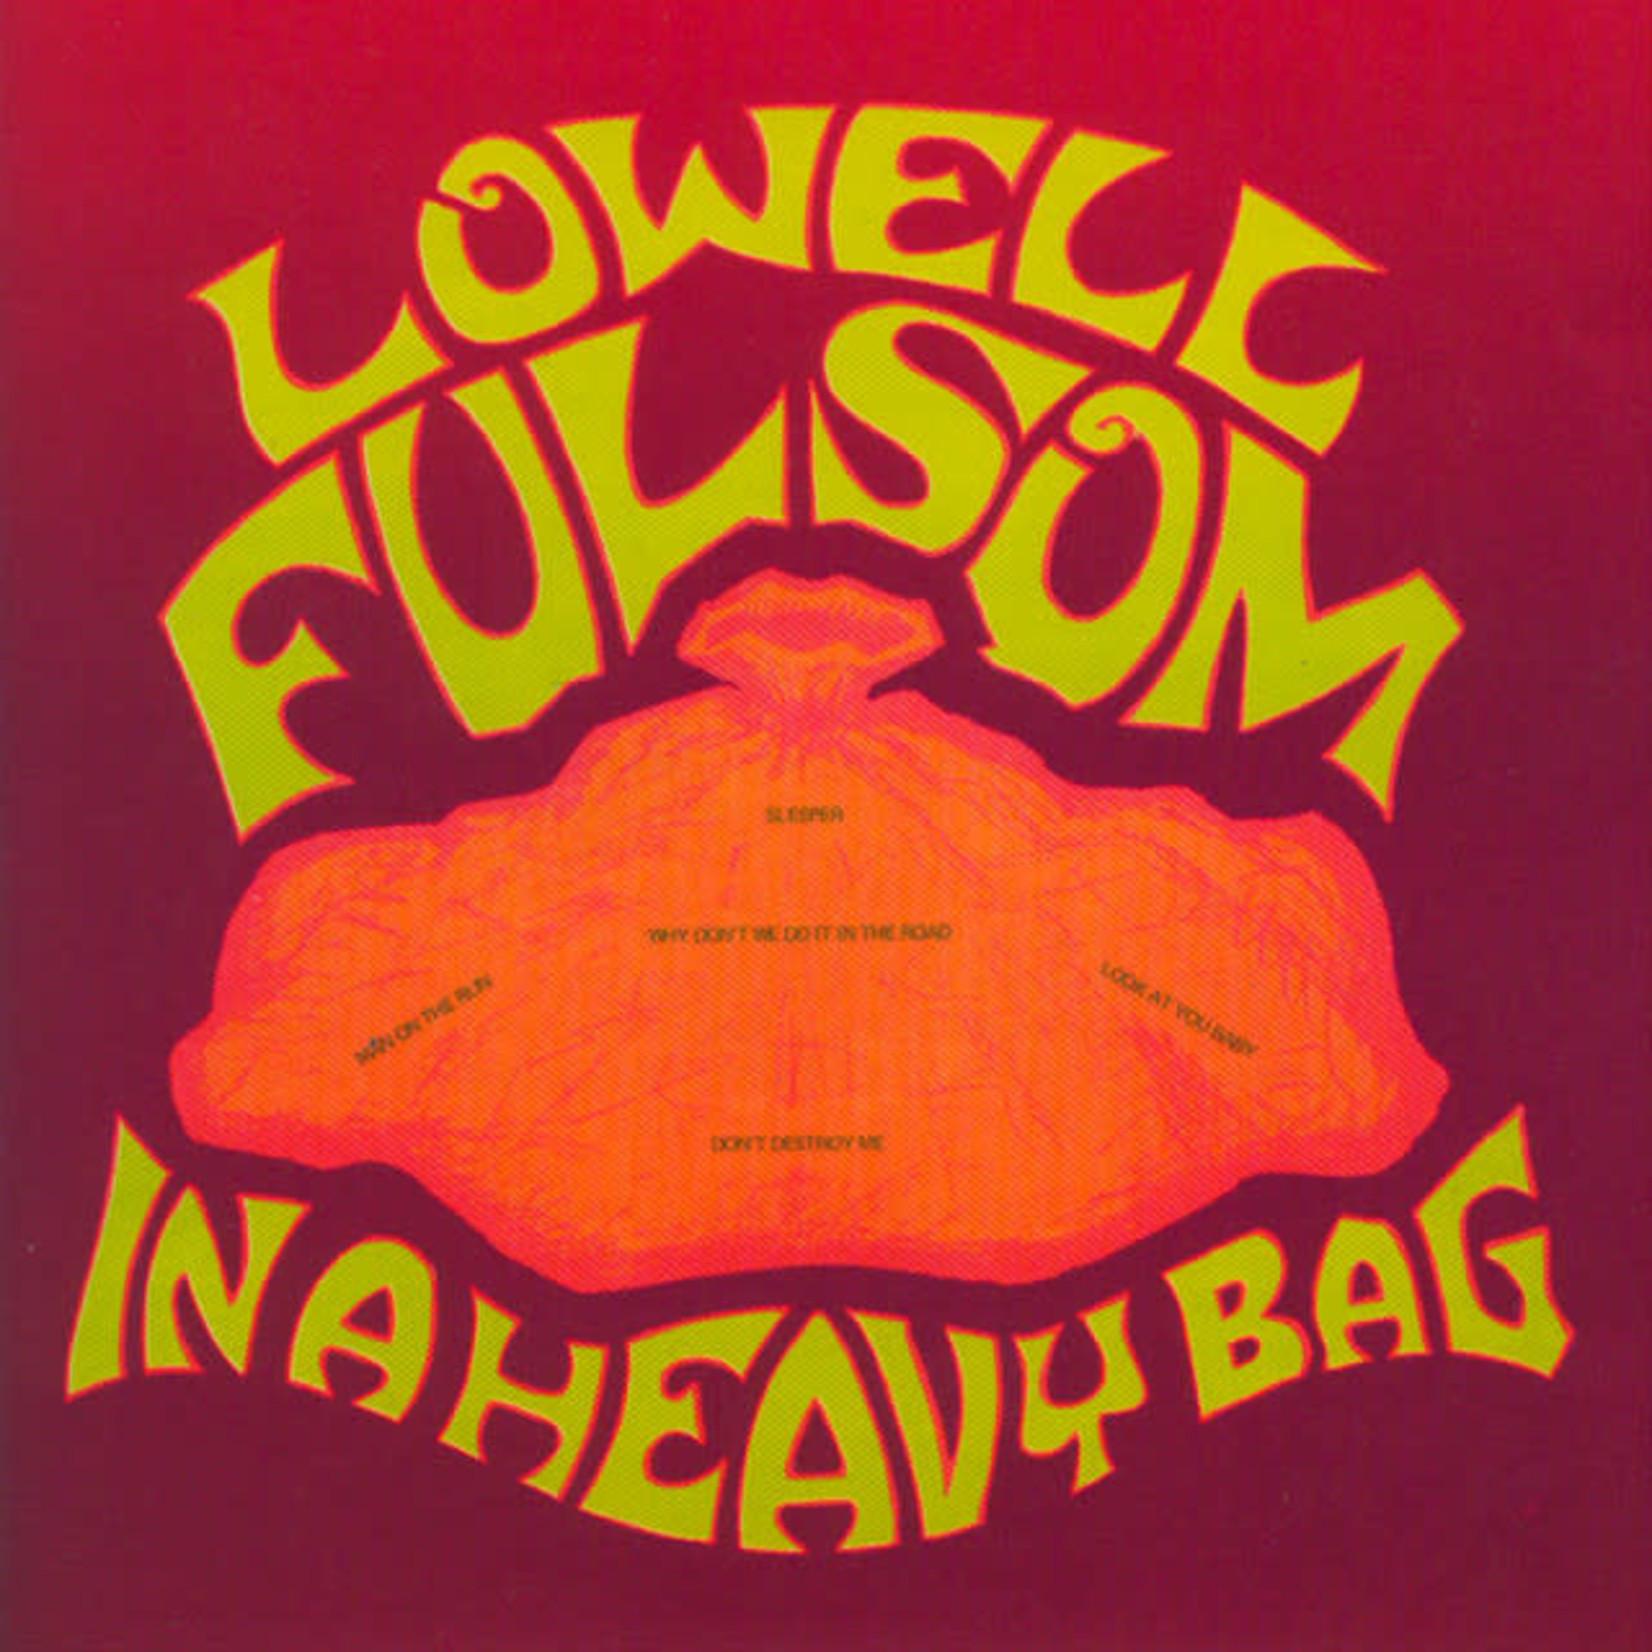 Vinyl Lowell Fulsom - In A Heavy Bag